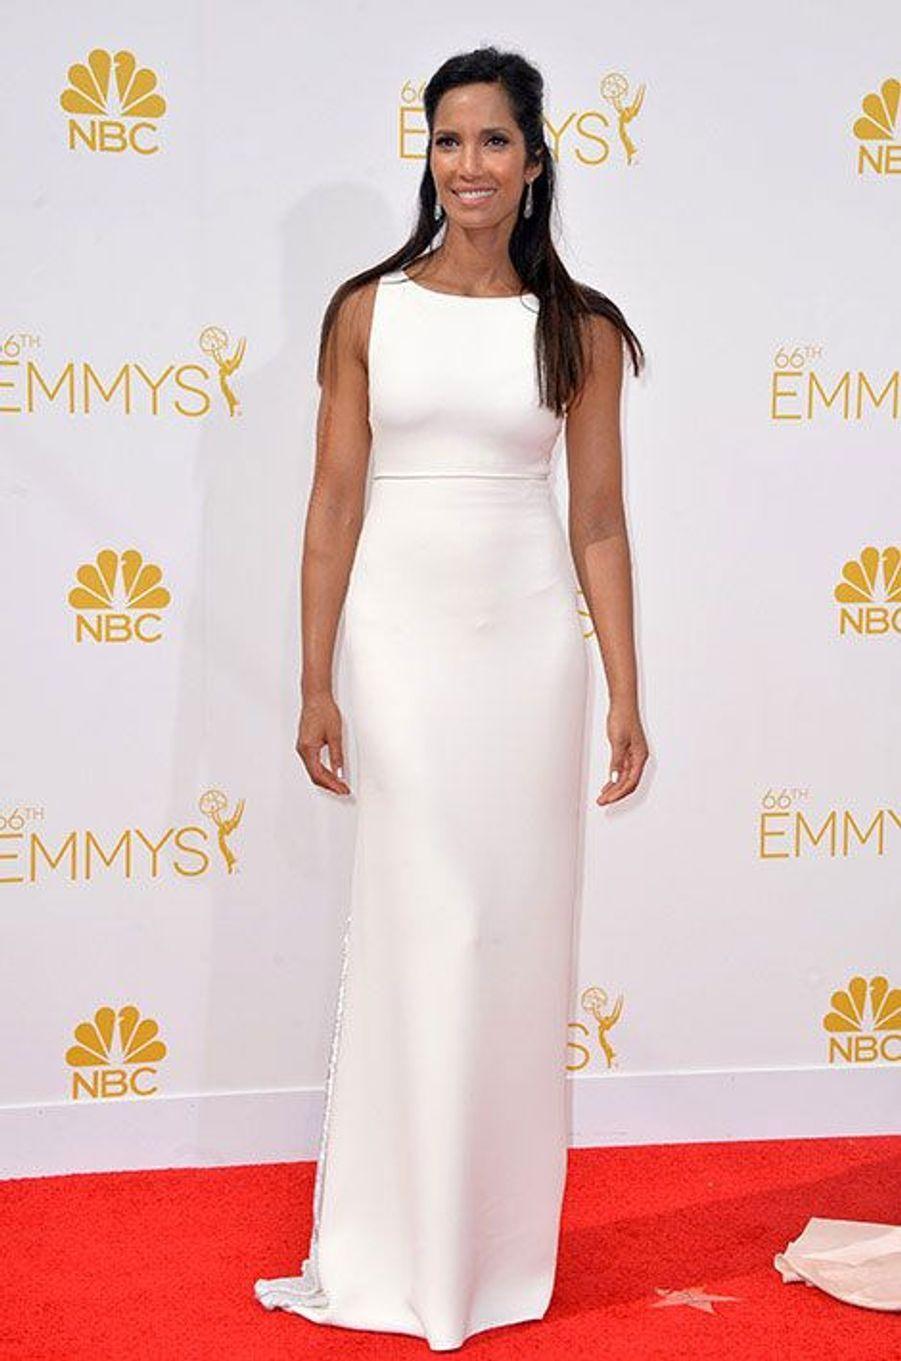 Padma Lakshmi aux Emmy Awards 2014